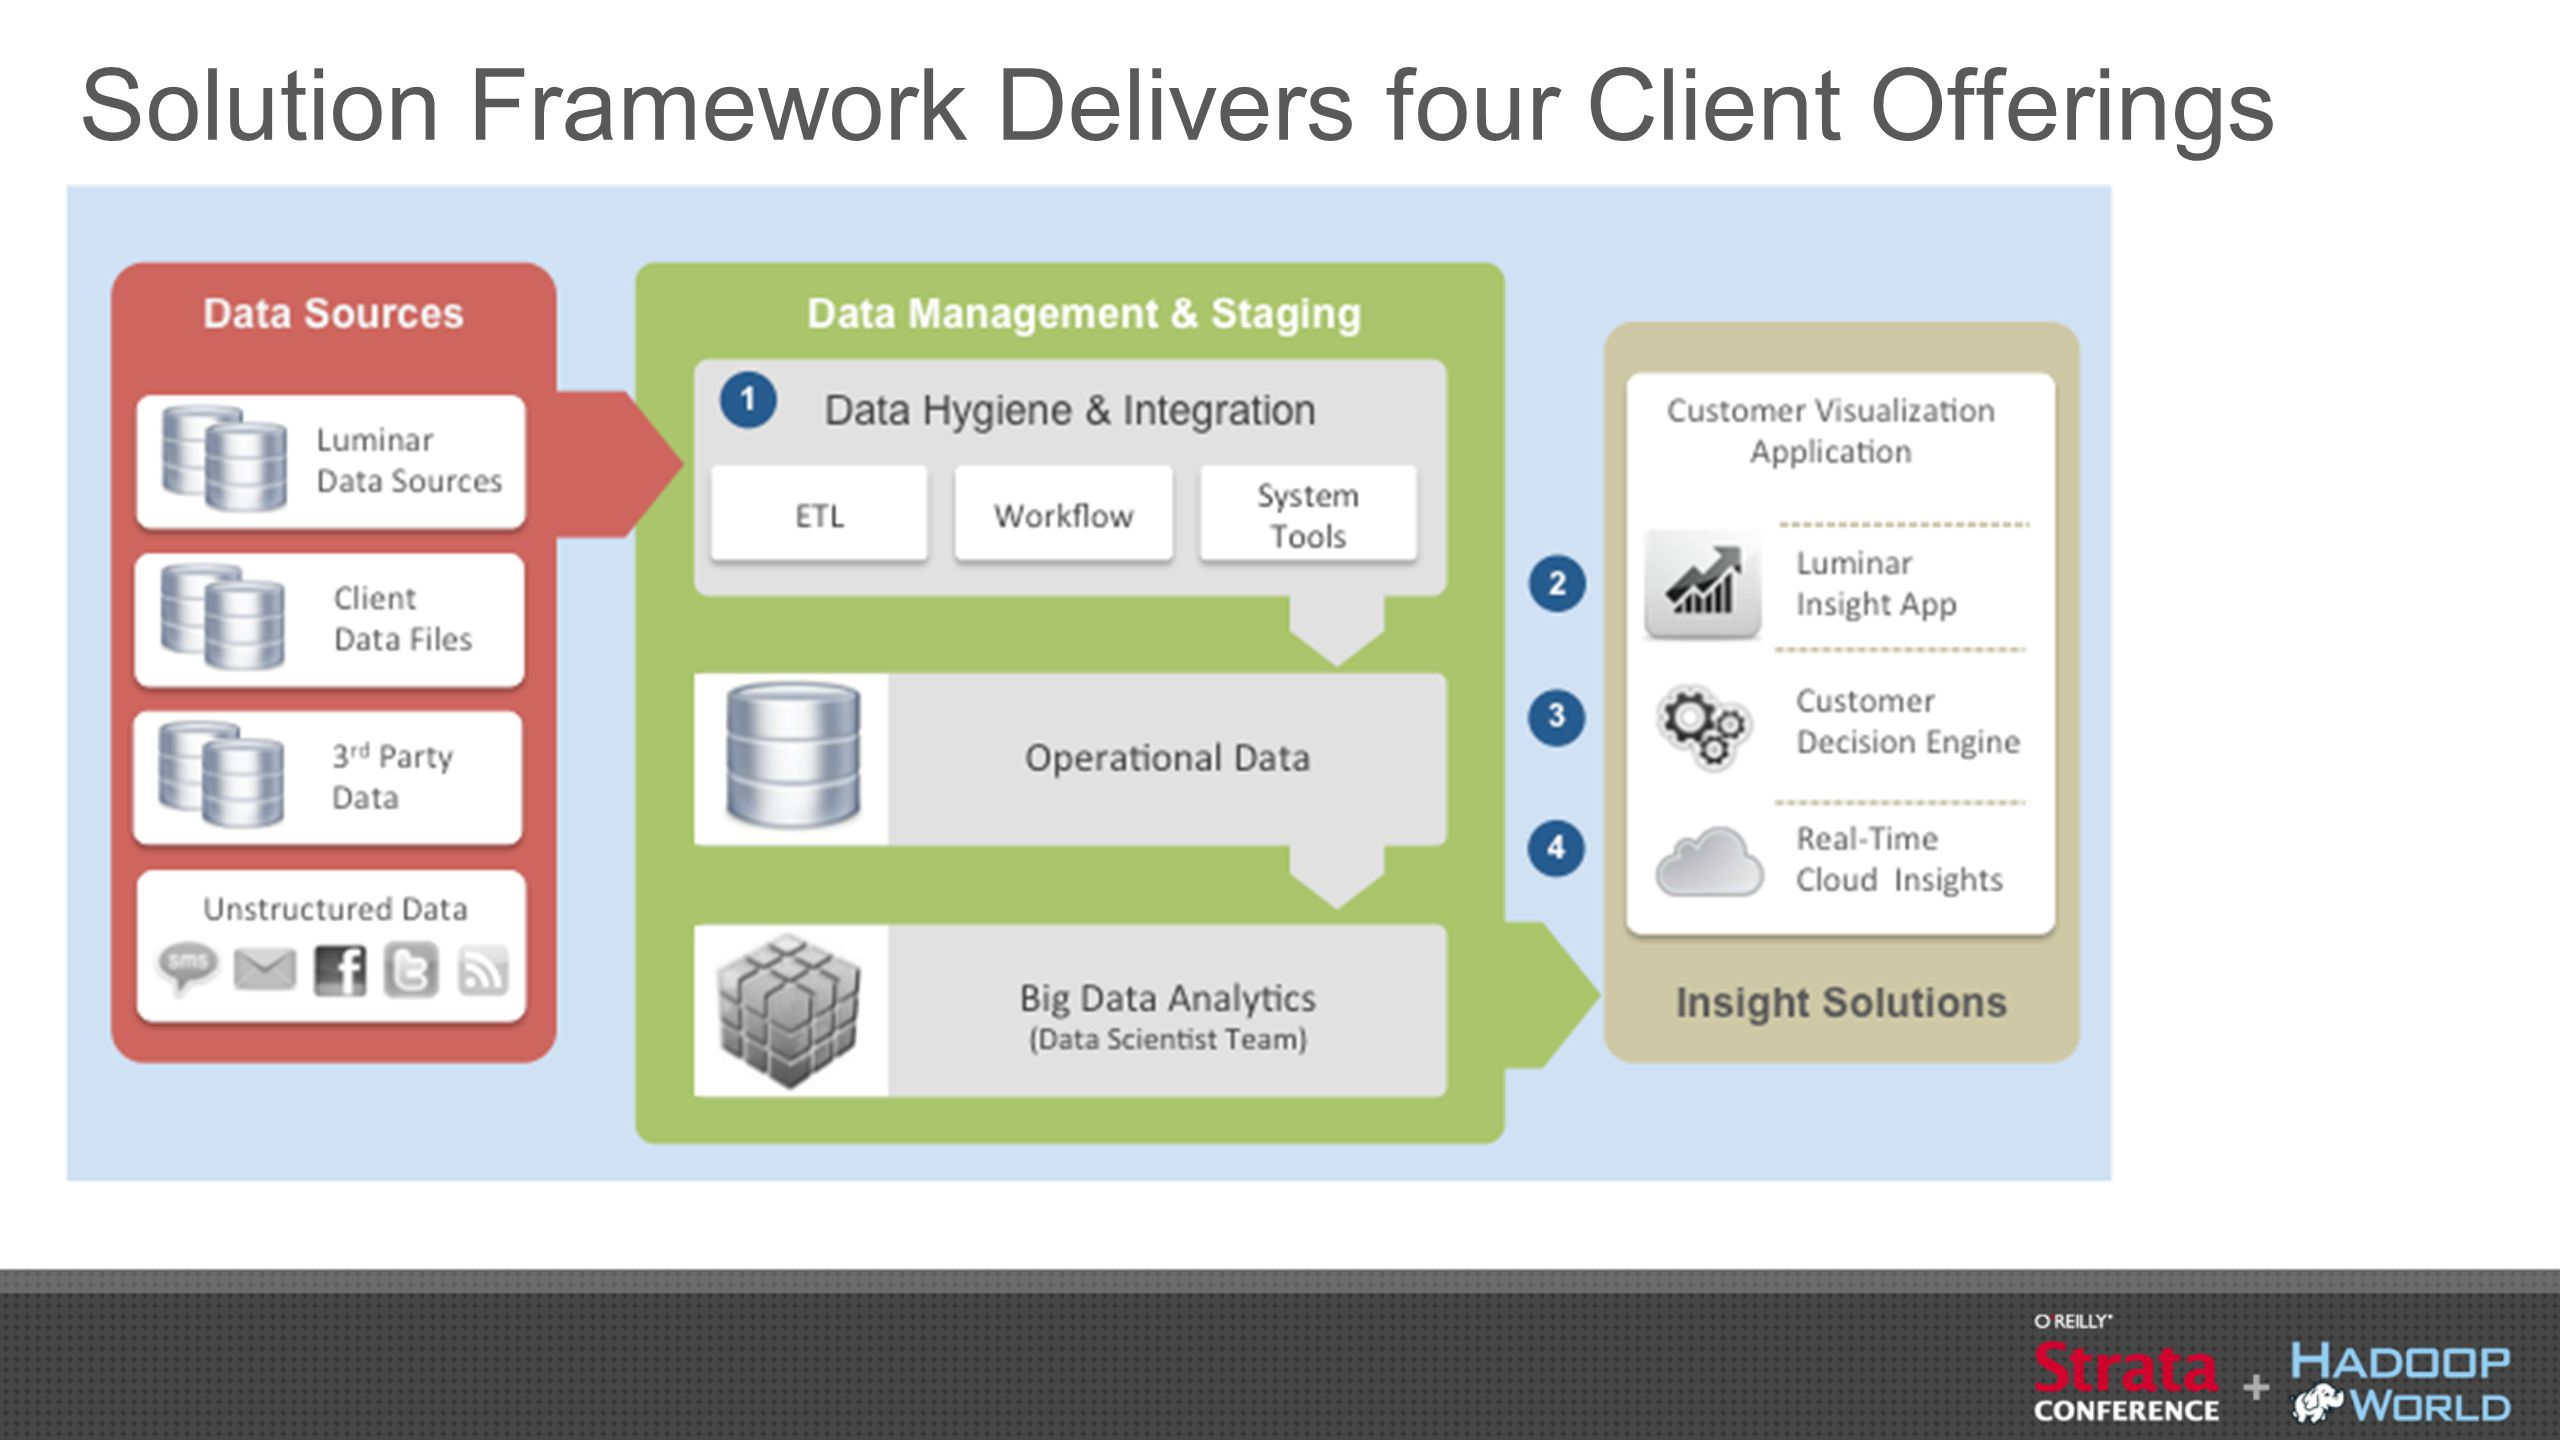 Solution Framework Delivers four Client Offerings